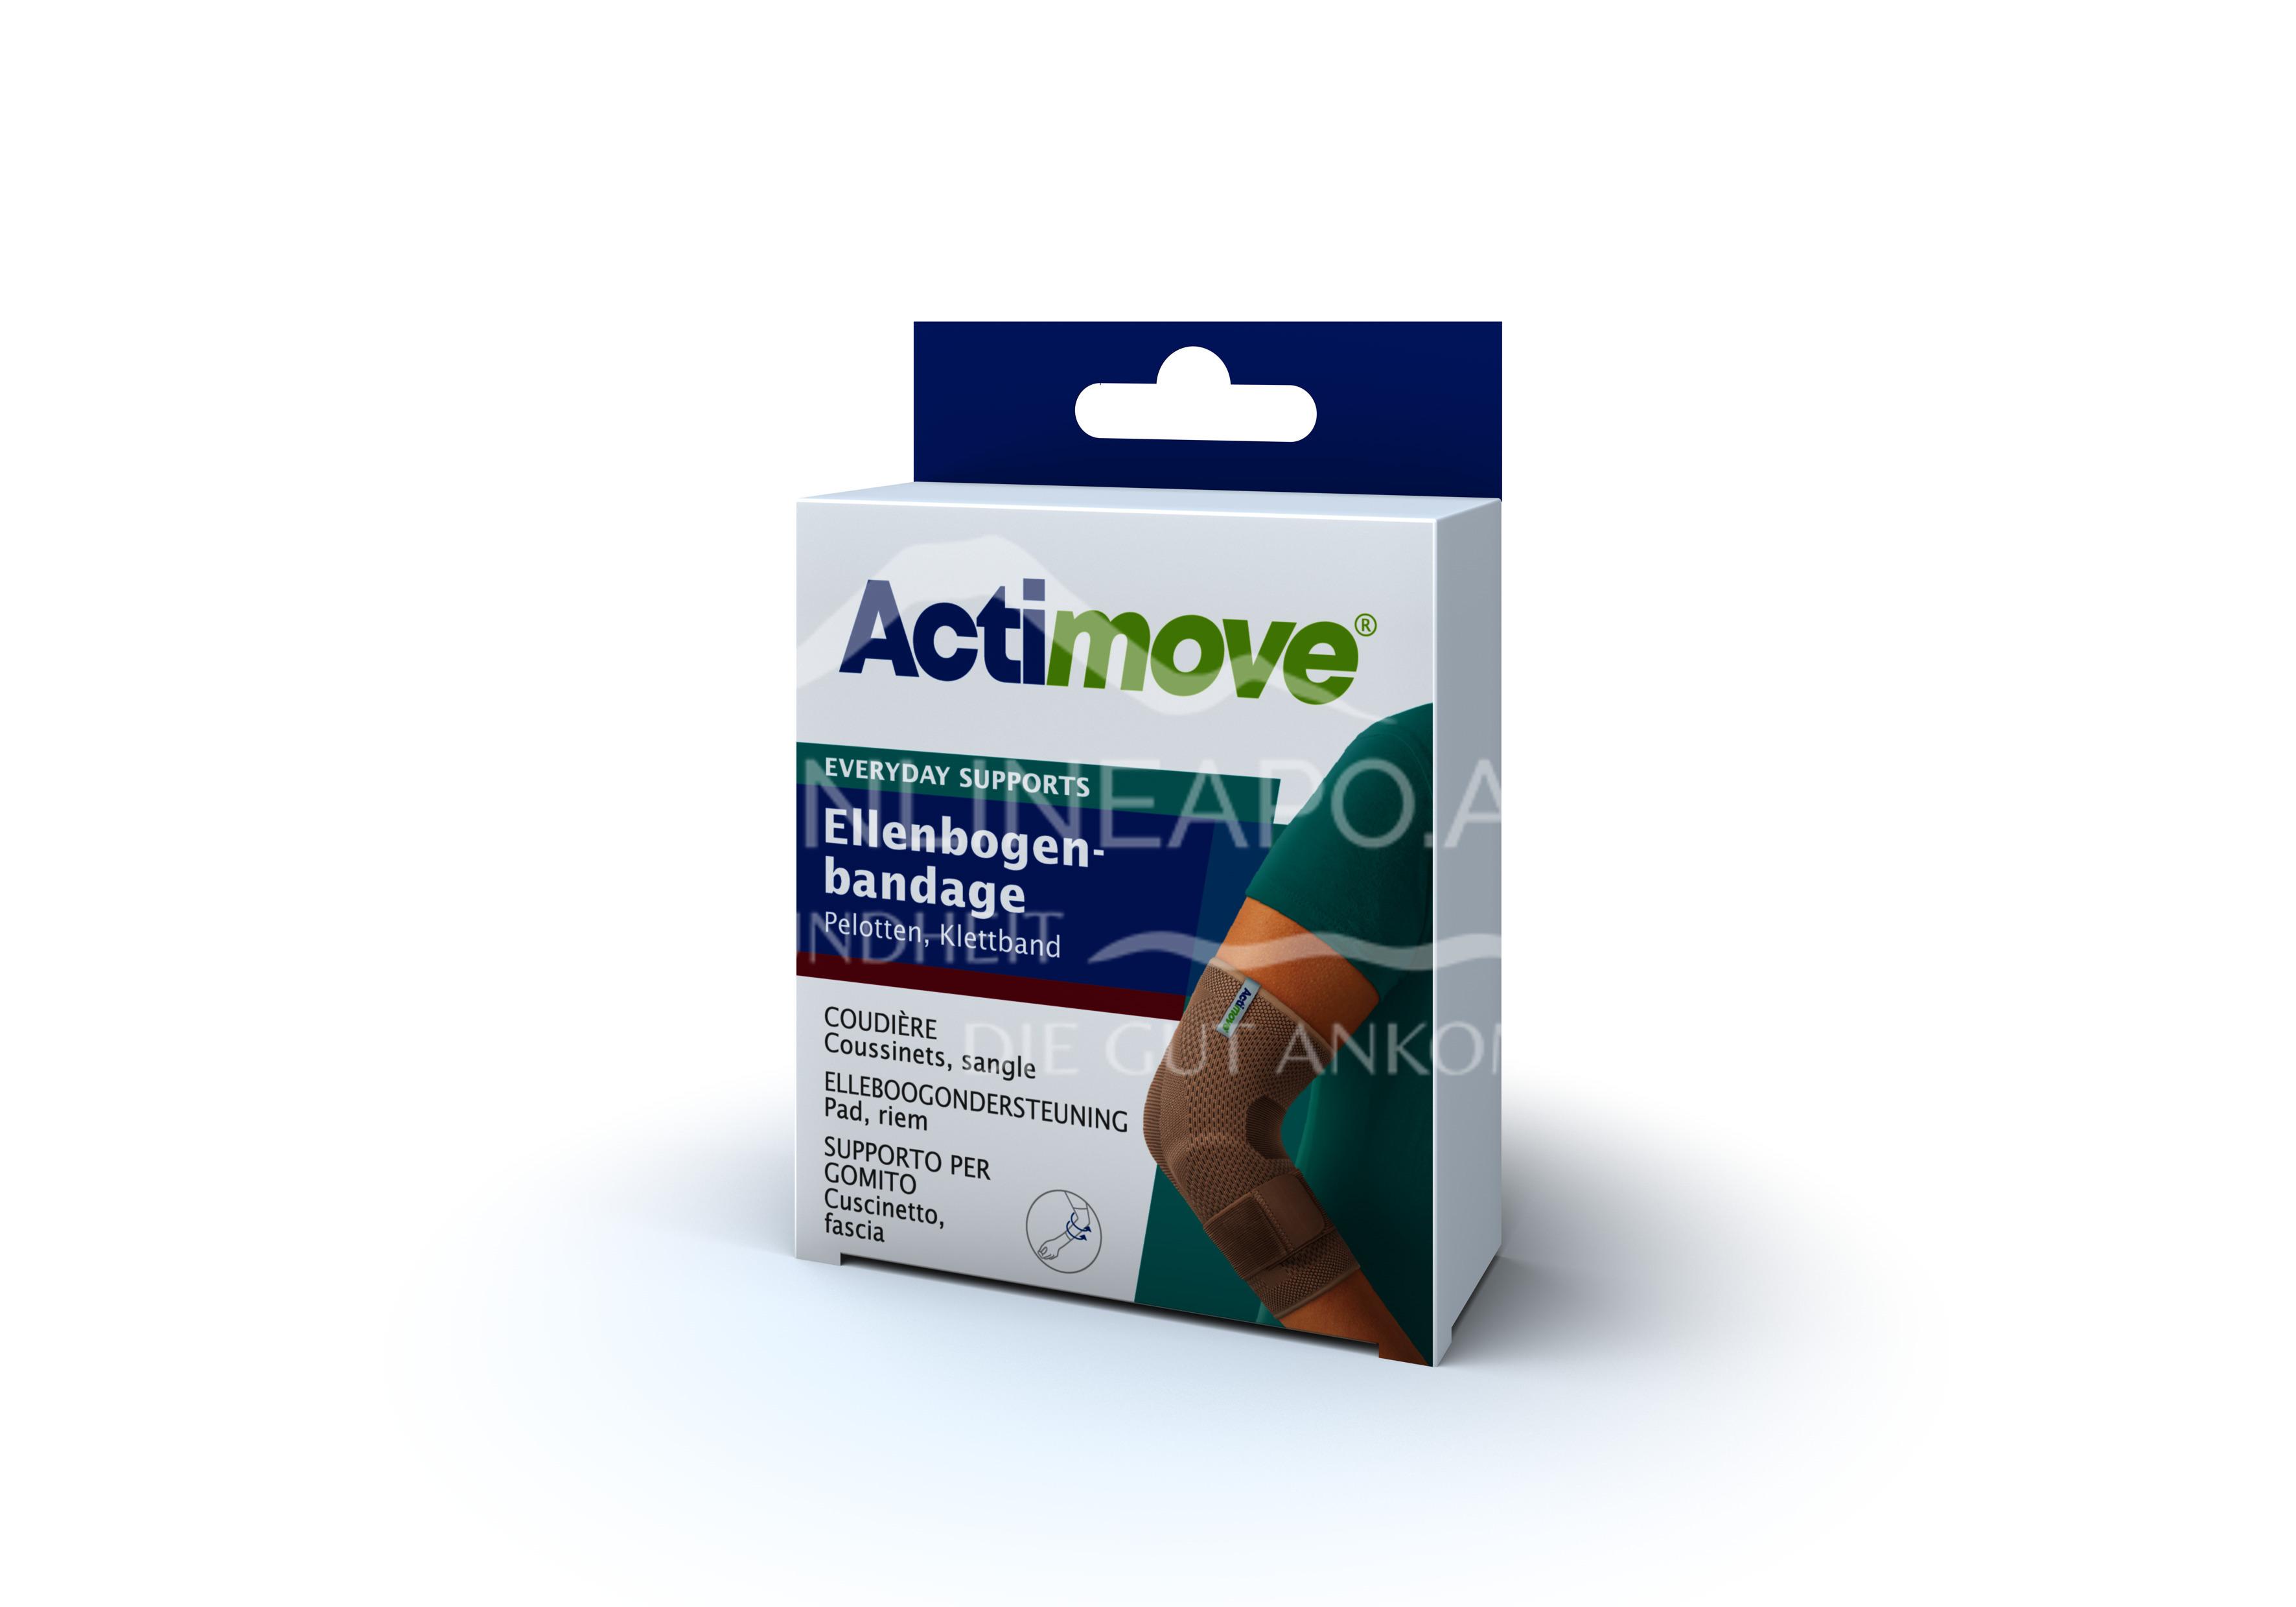 Actimove® Everyday Supports Ellenbogenbandage Pelotten, Klebeband Größe L